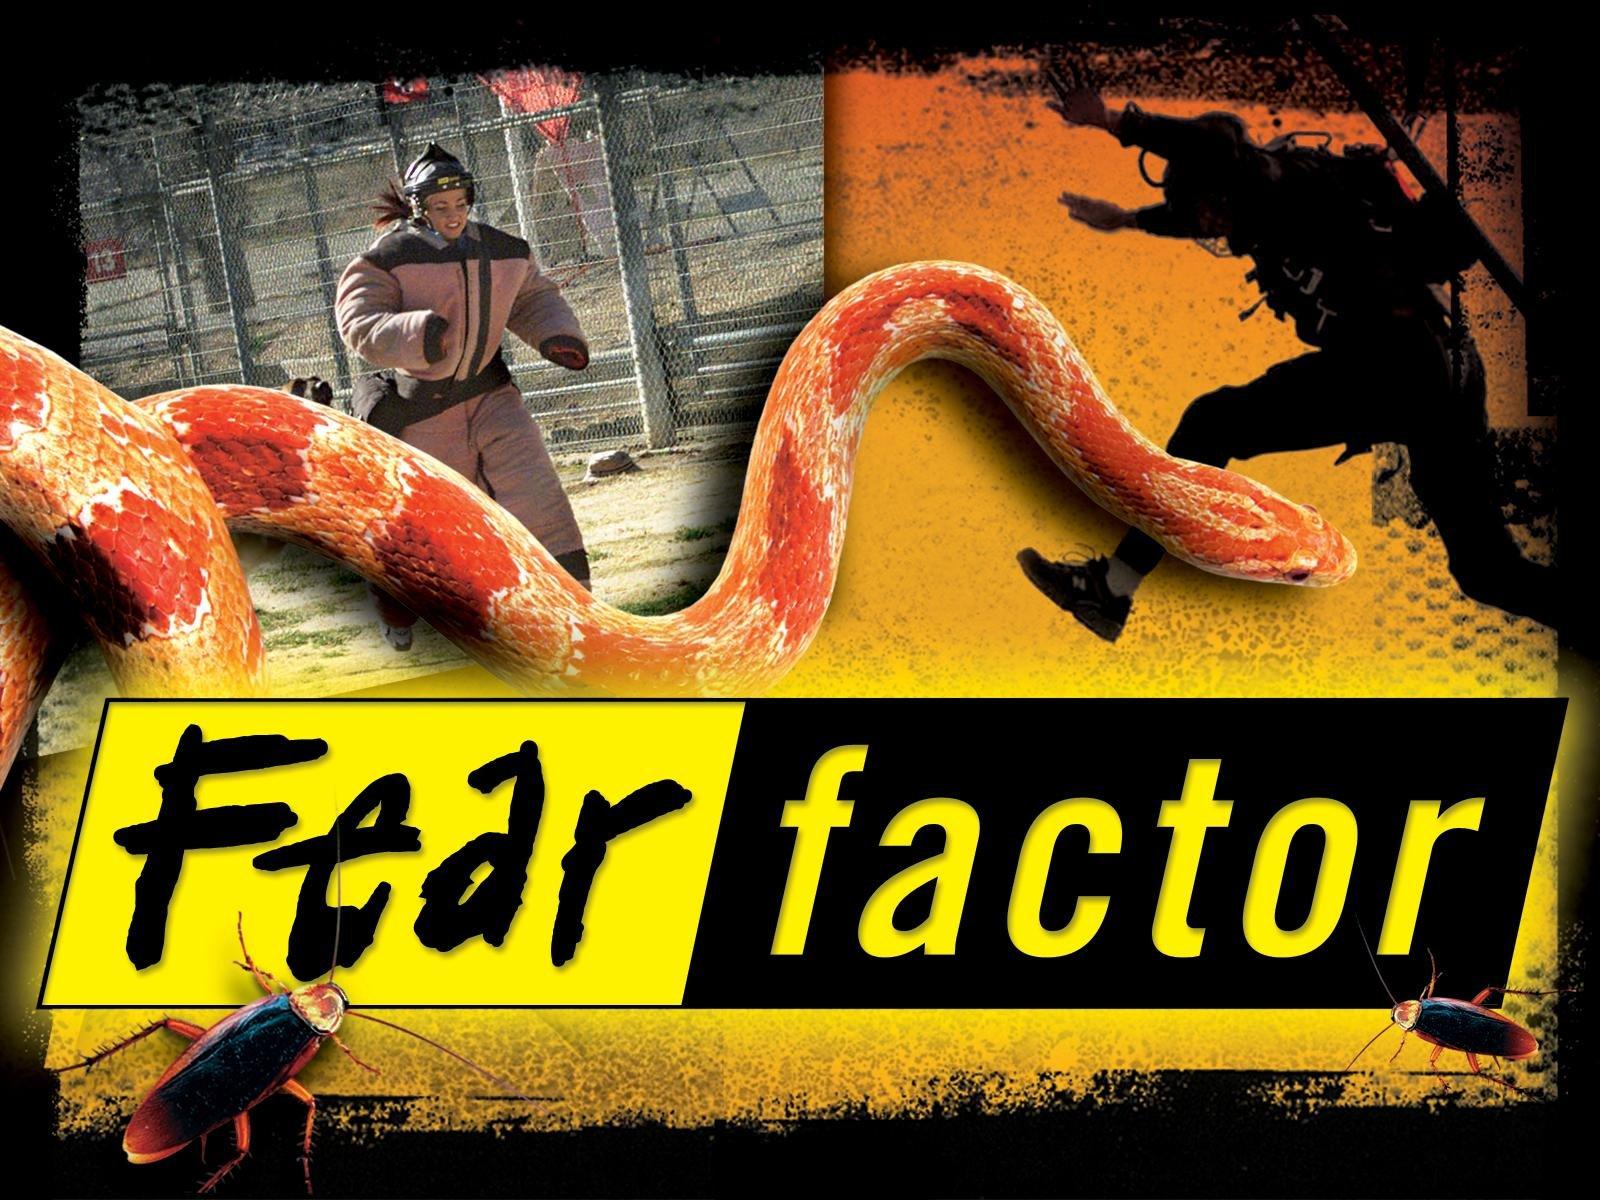 amazon com fear factor season 6 amazon digital services llc